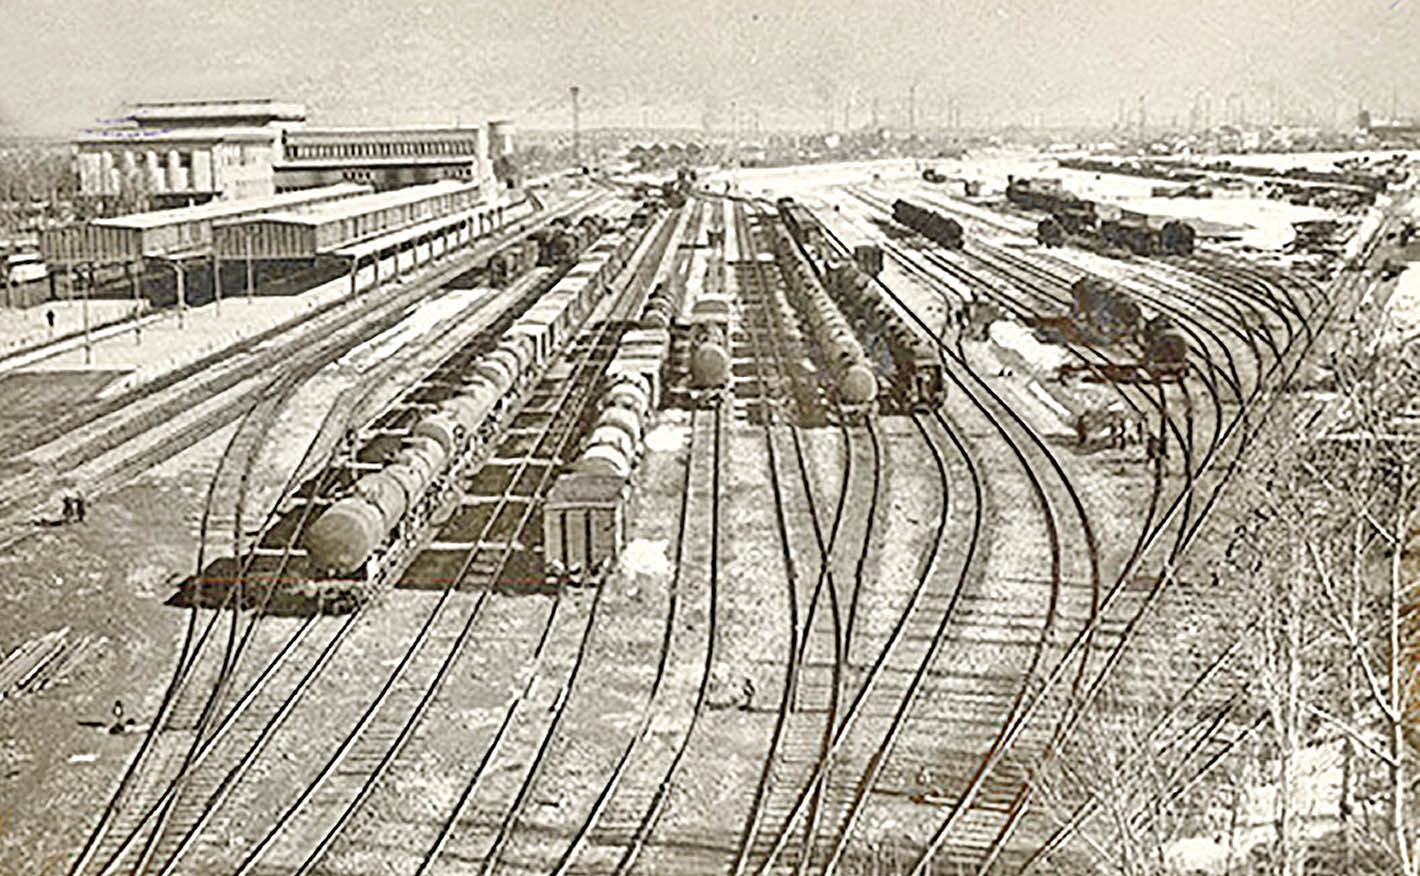 کلنگ اولین راهآهن دولتی ایران